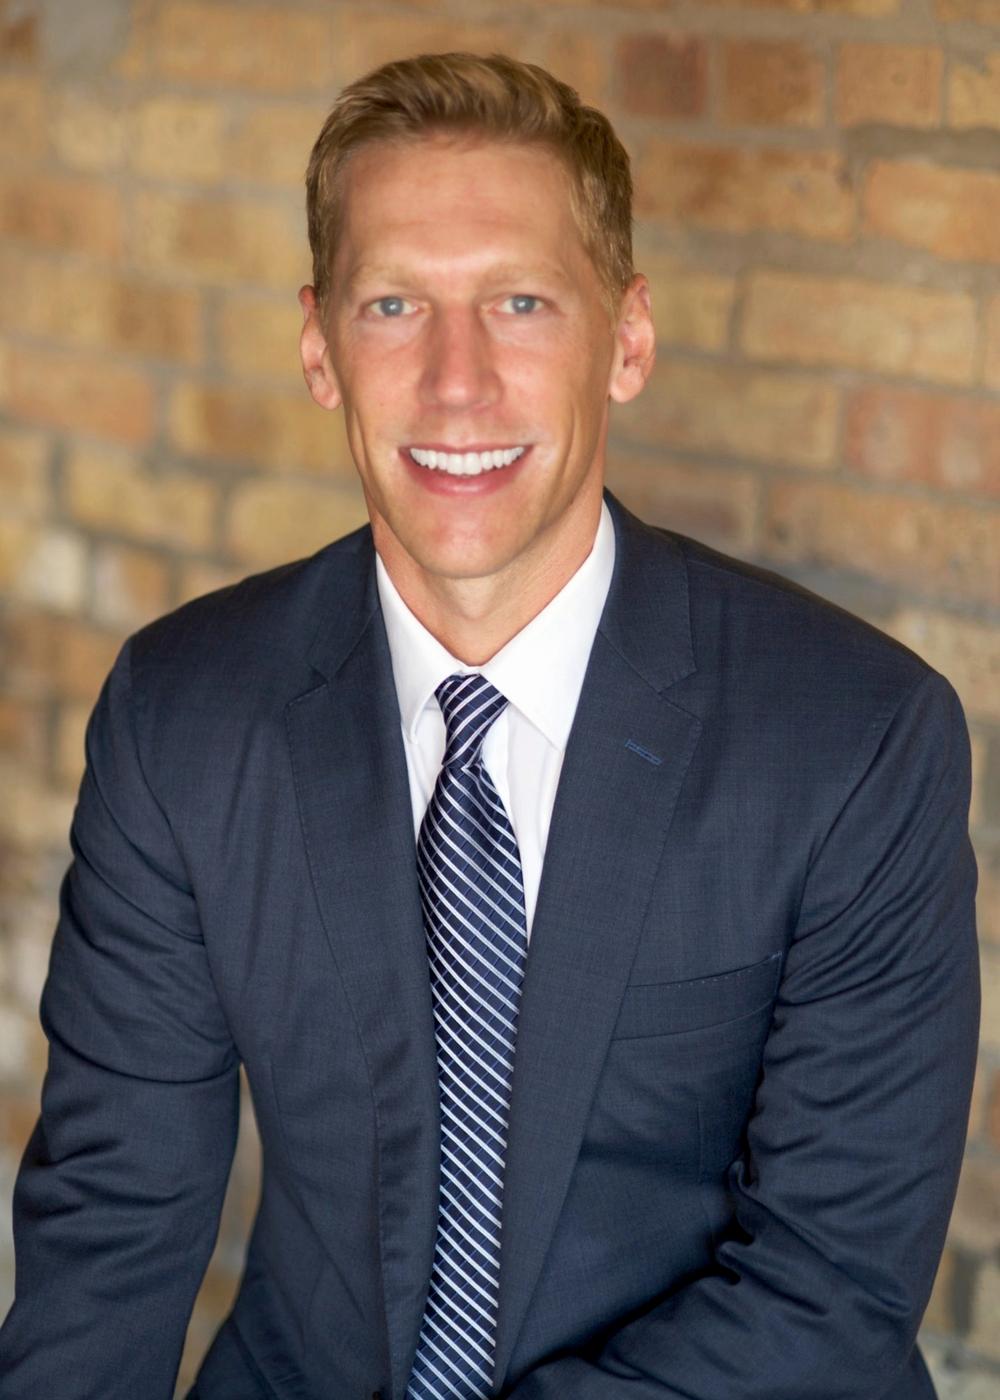 chicago real estate agent profile